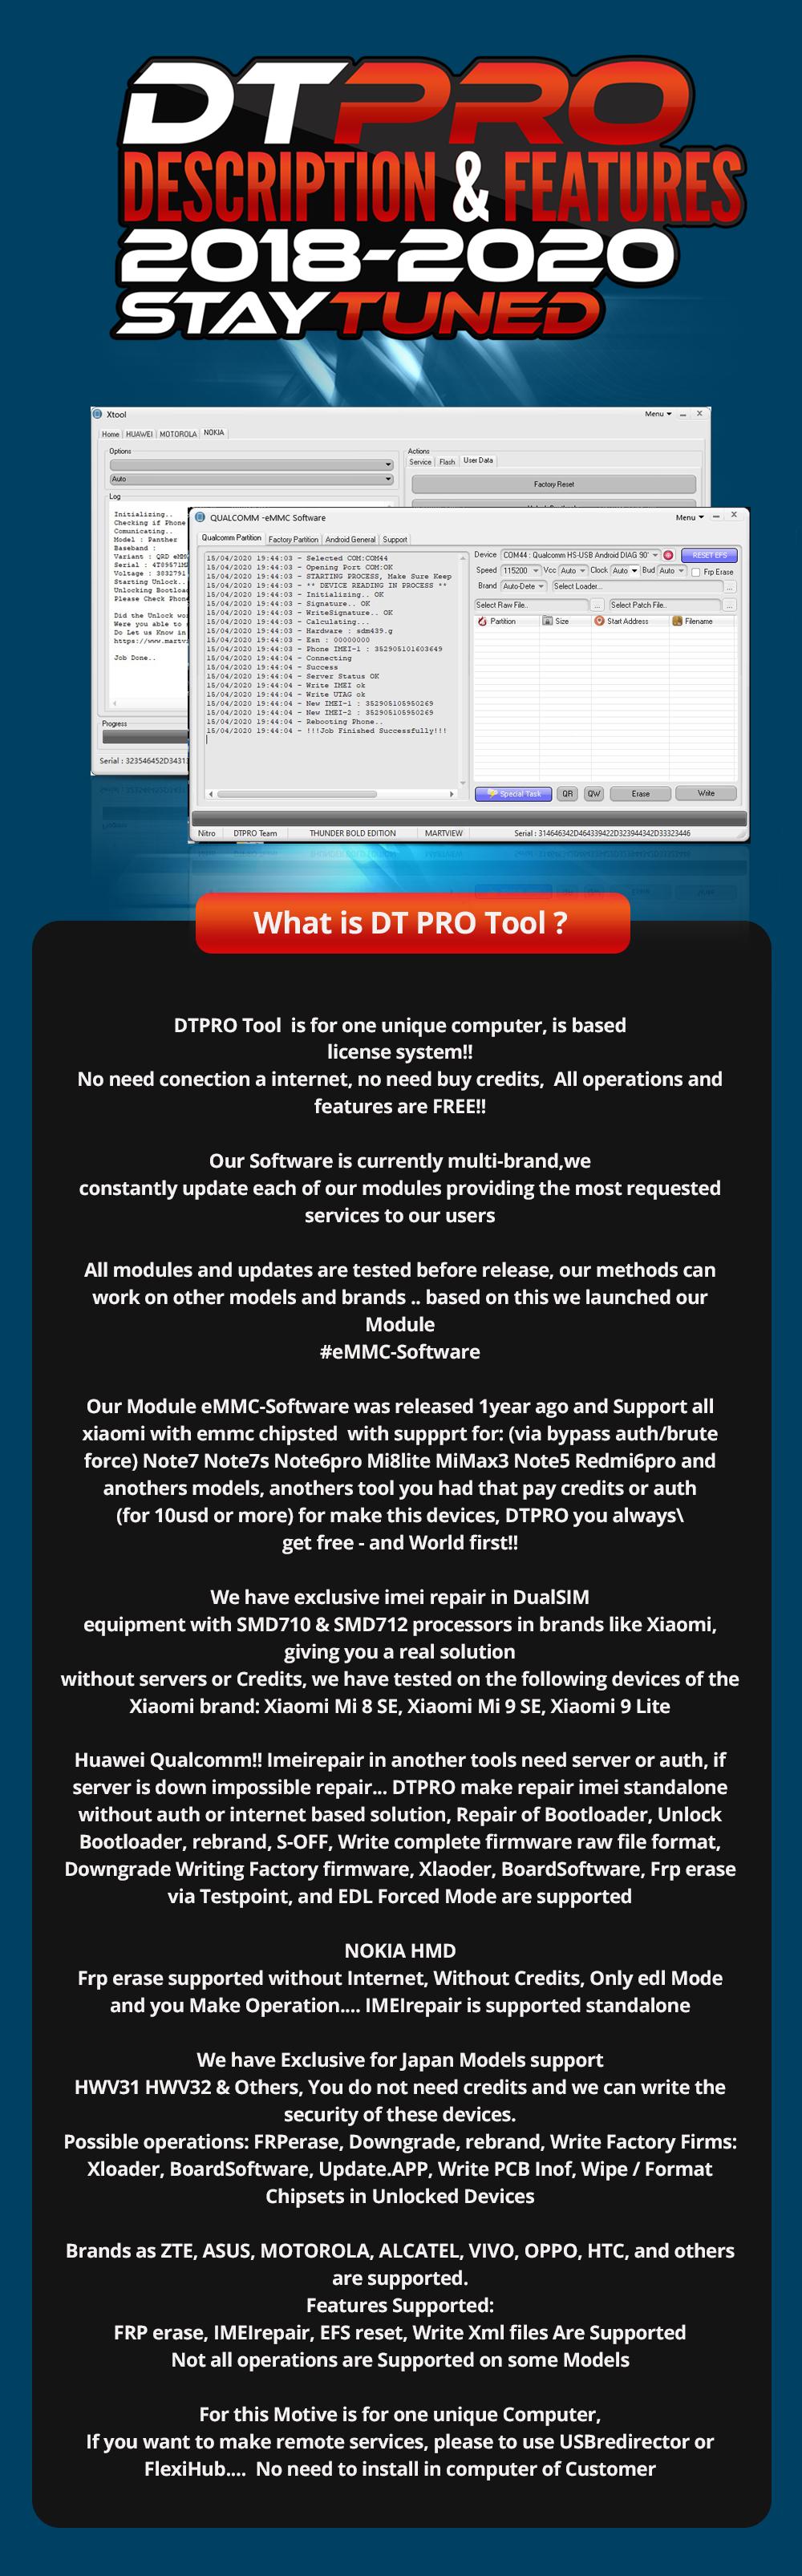 What is DTPRO? (Description and Features)